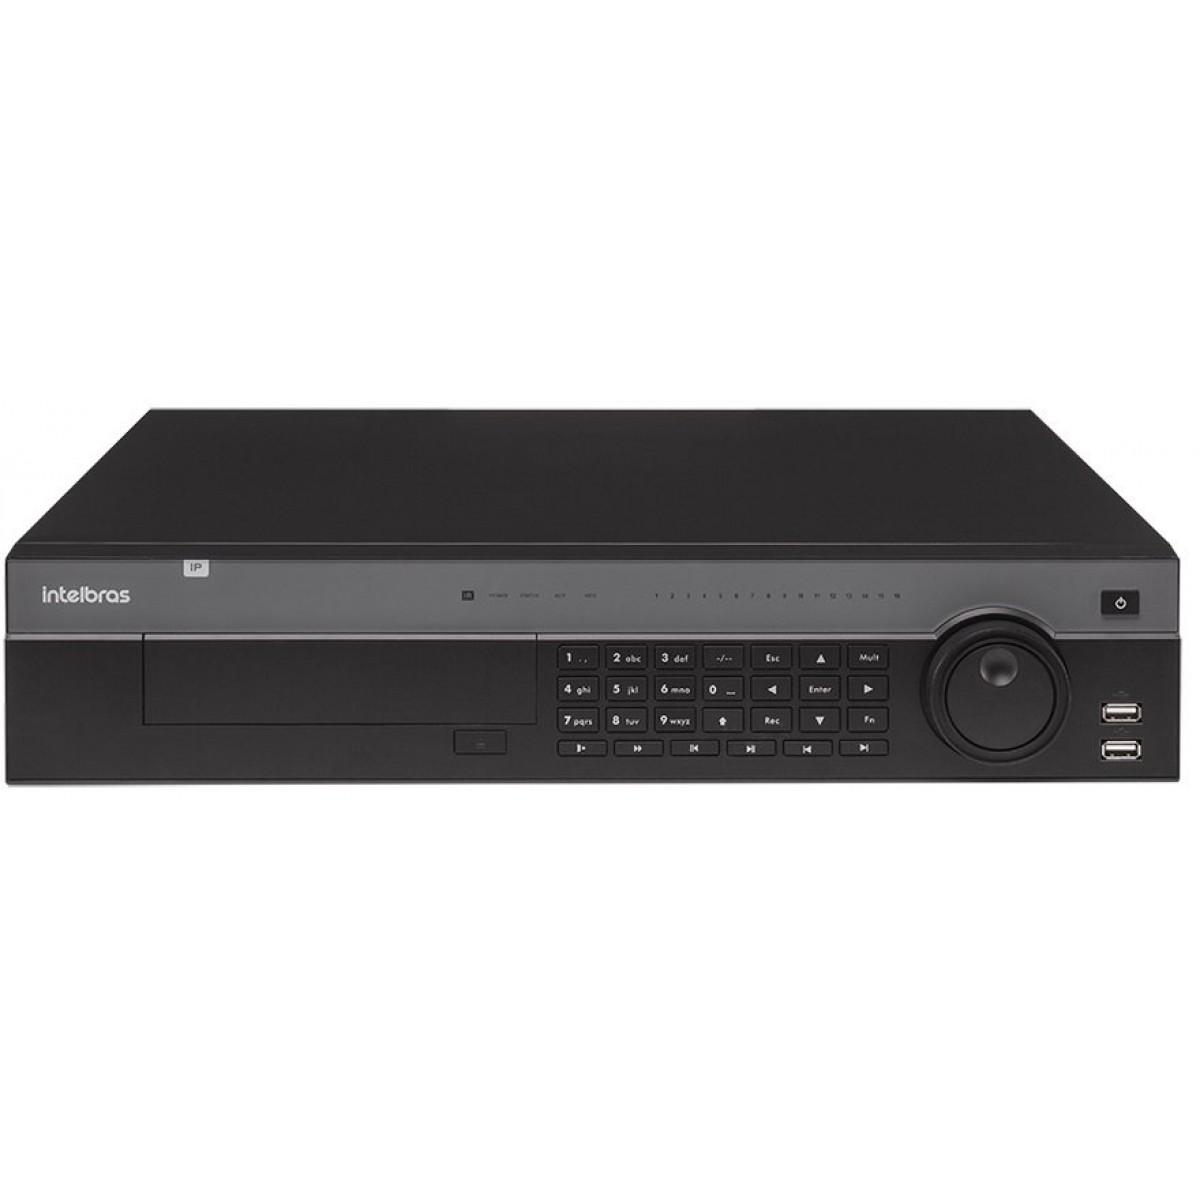 Gravador digital de imagem Intelbras NVD 7132 NSeries